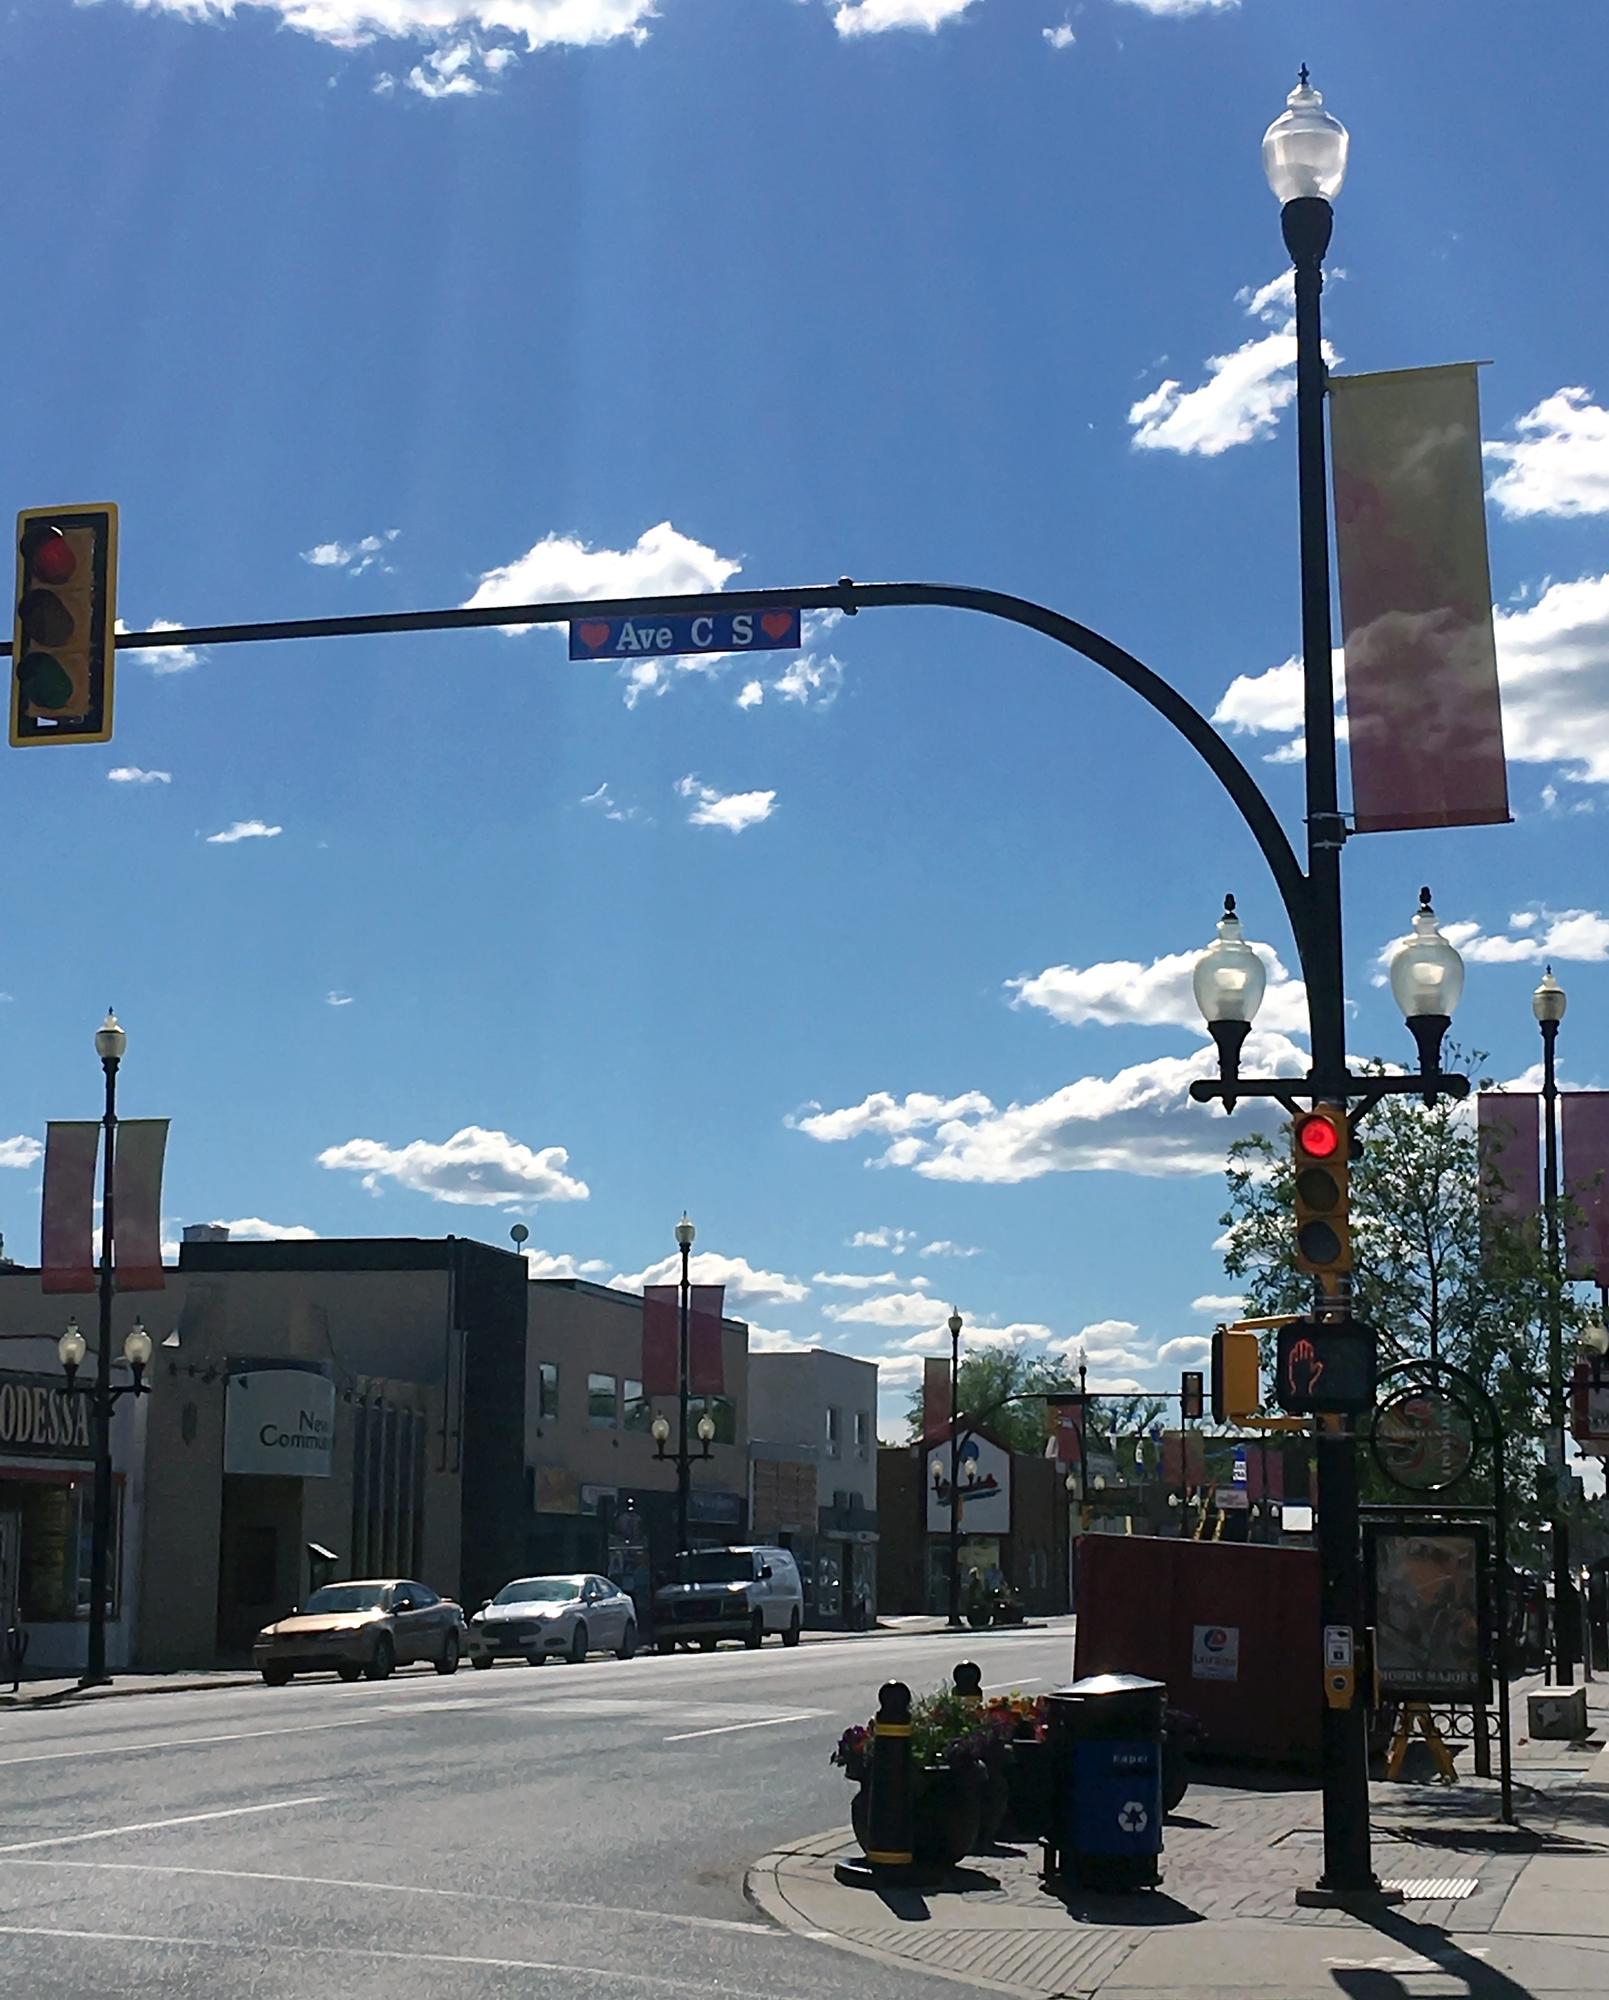 Generic Van Life - Saskatchewan Saskatoon Ave C